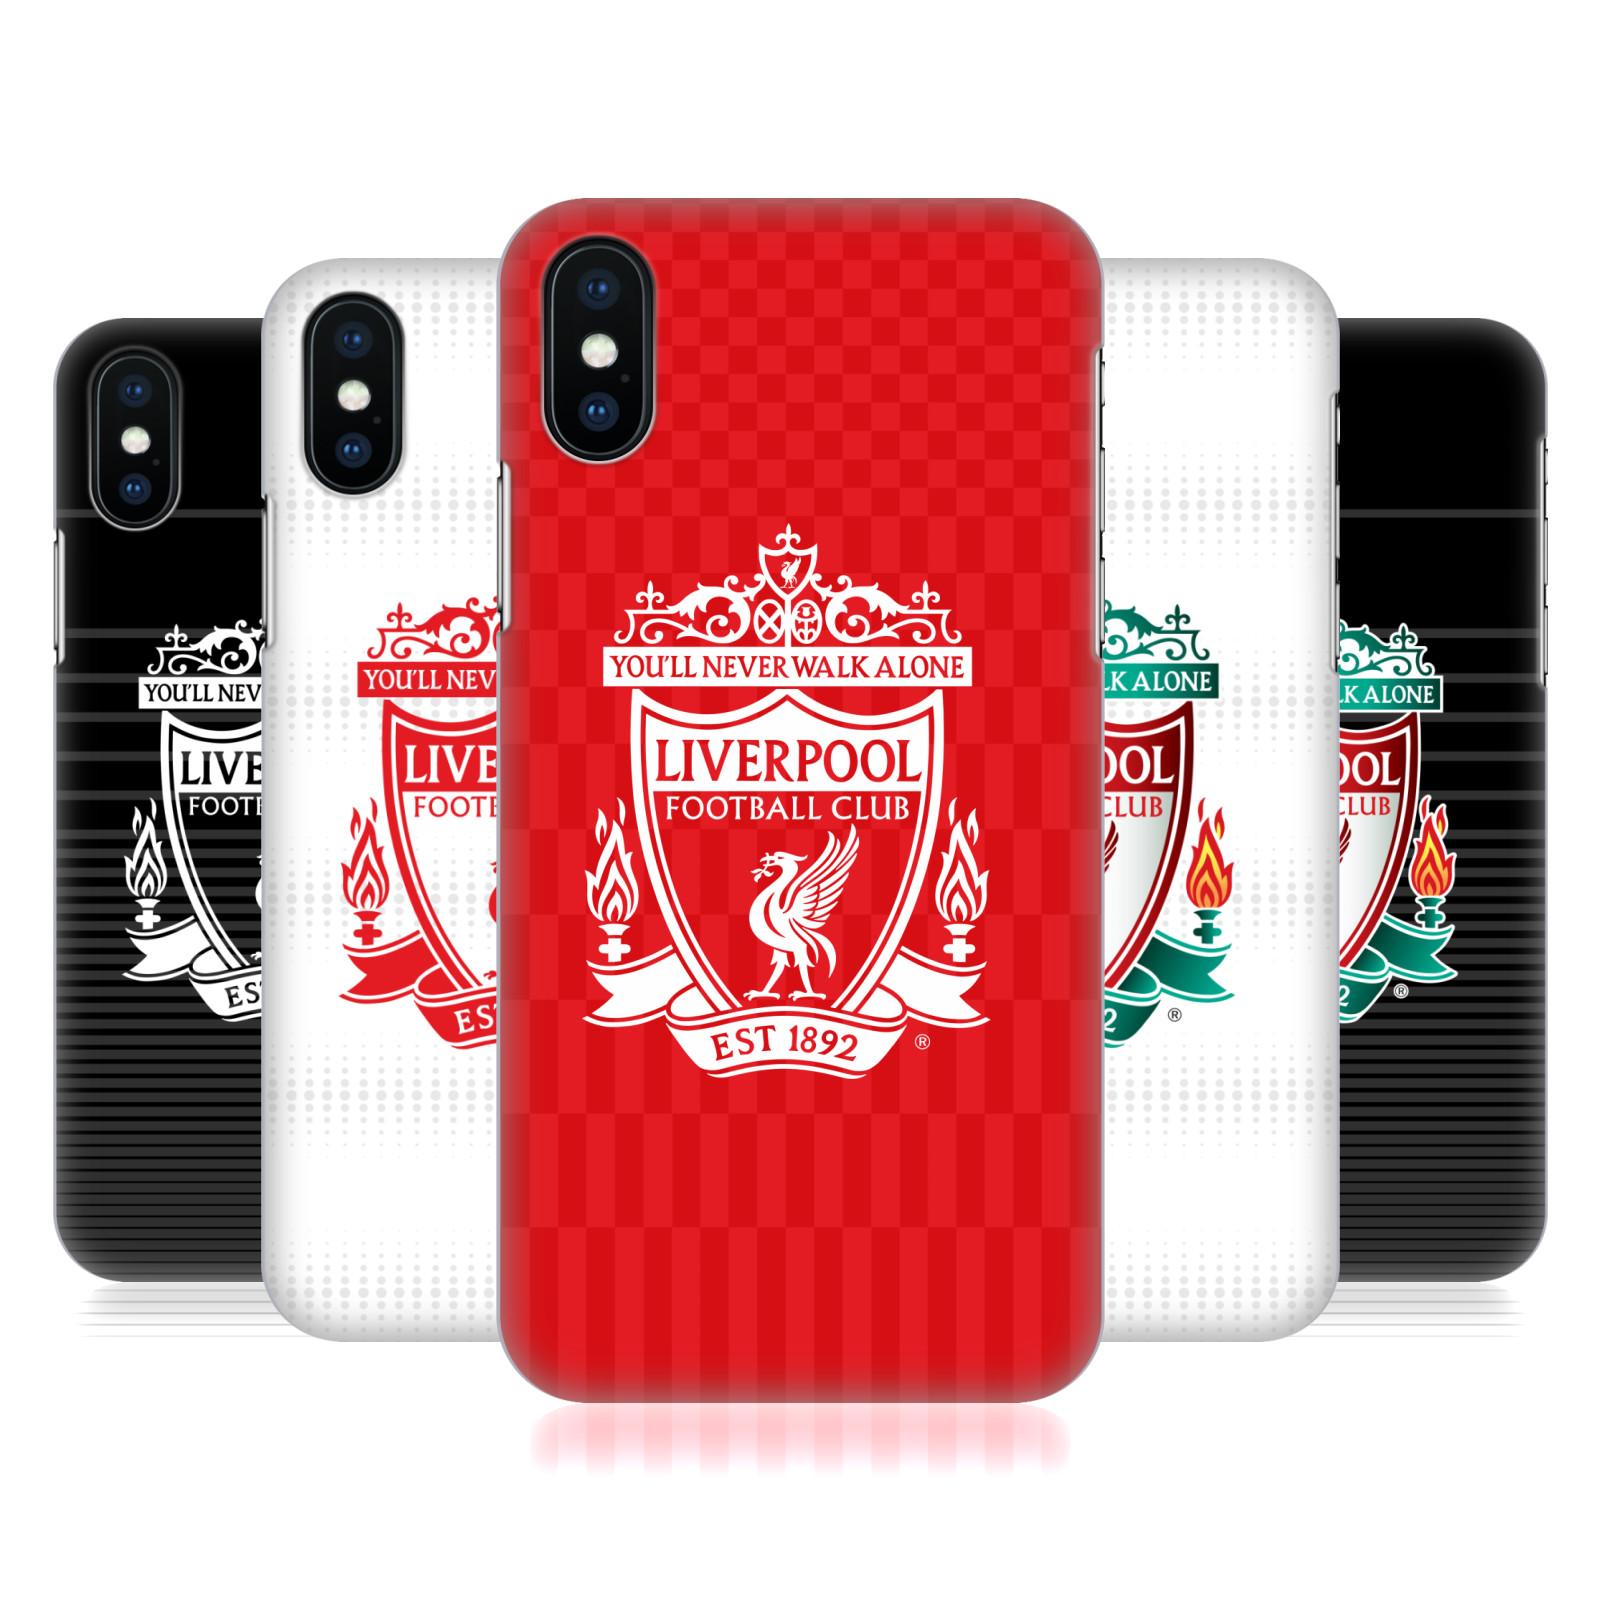 Liverpool Football Club Crest Designs